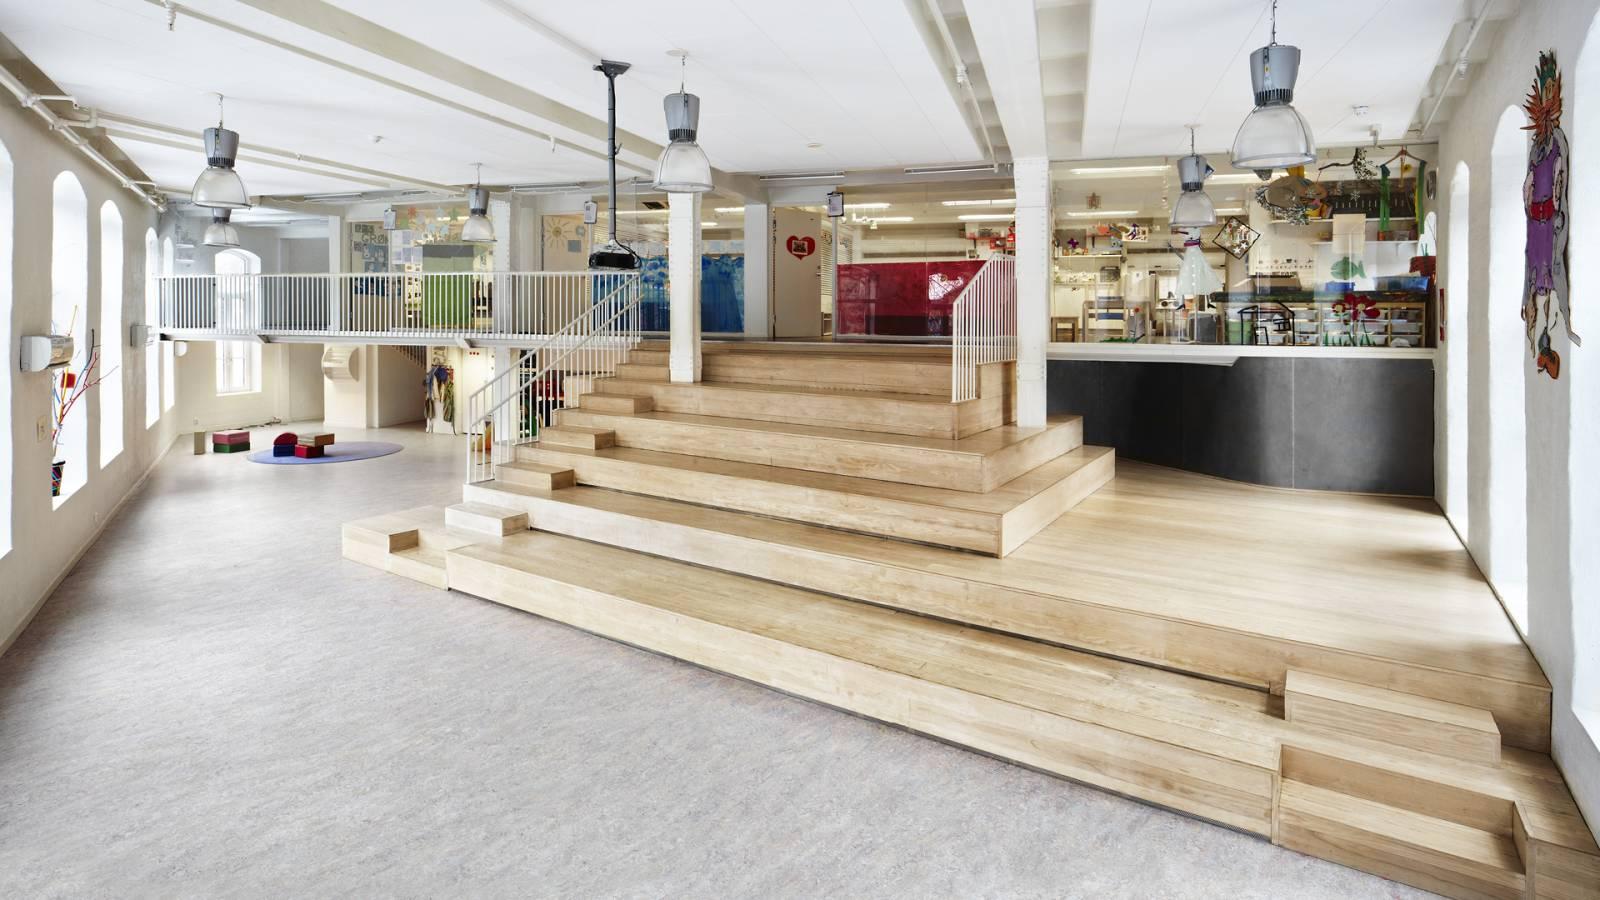 ASSEMBLY ROOM - Ny York Cultural kindergarten - SPOL Architects